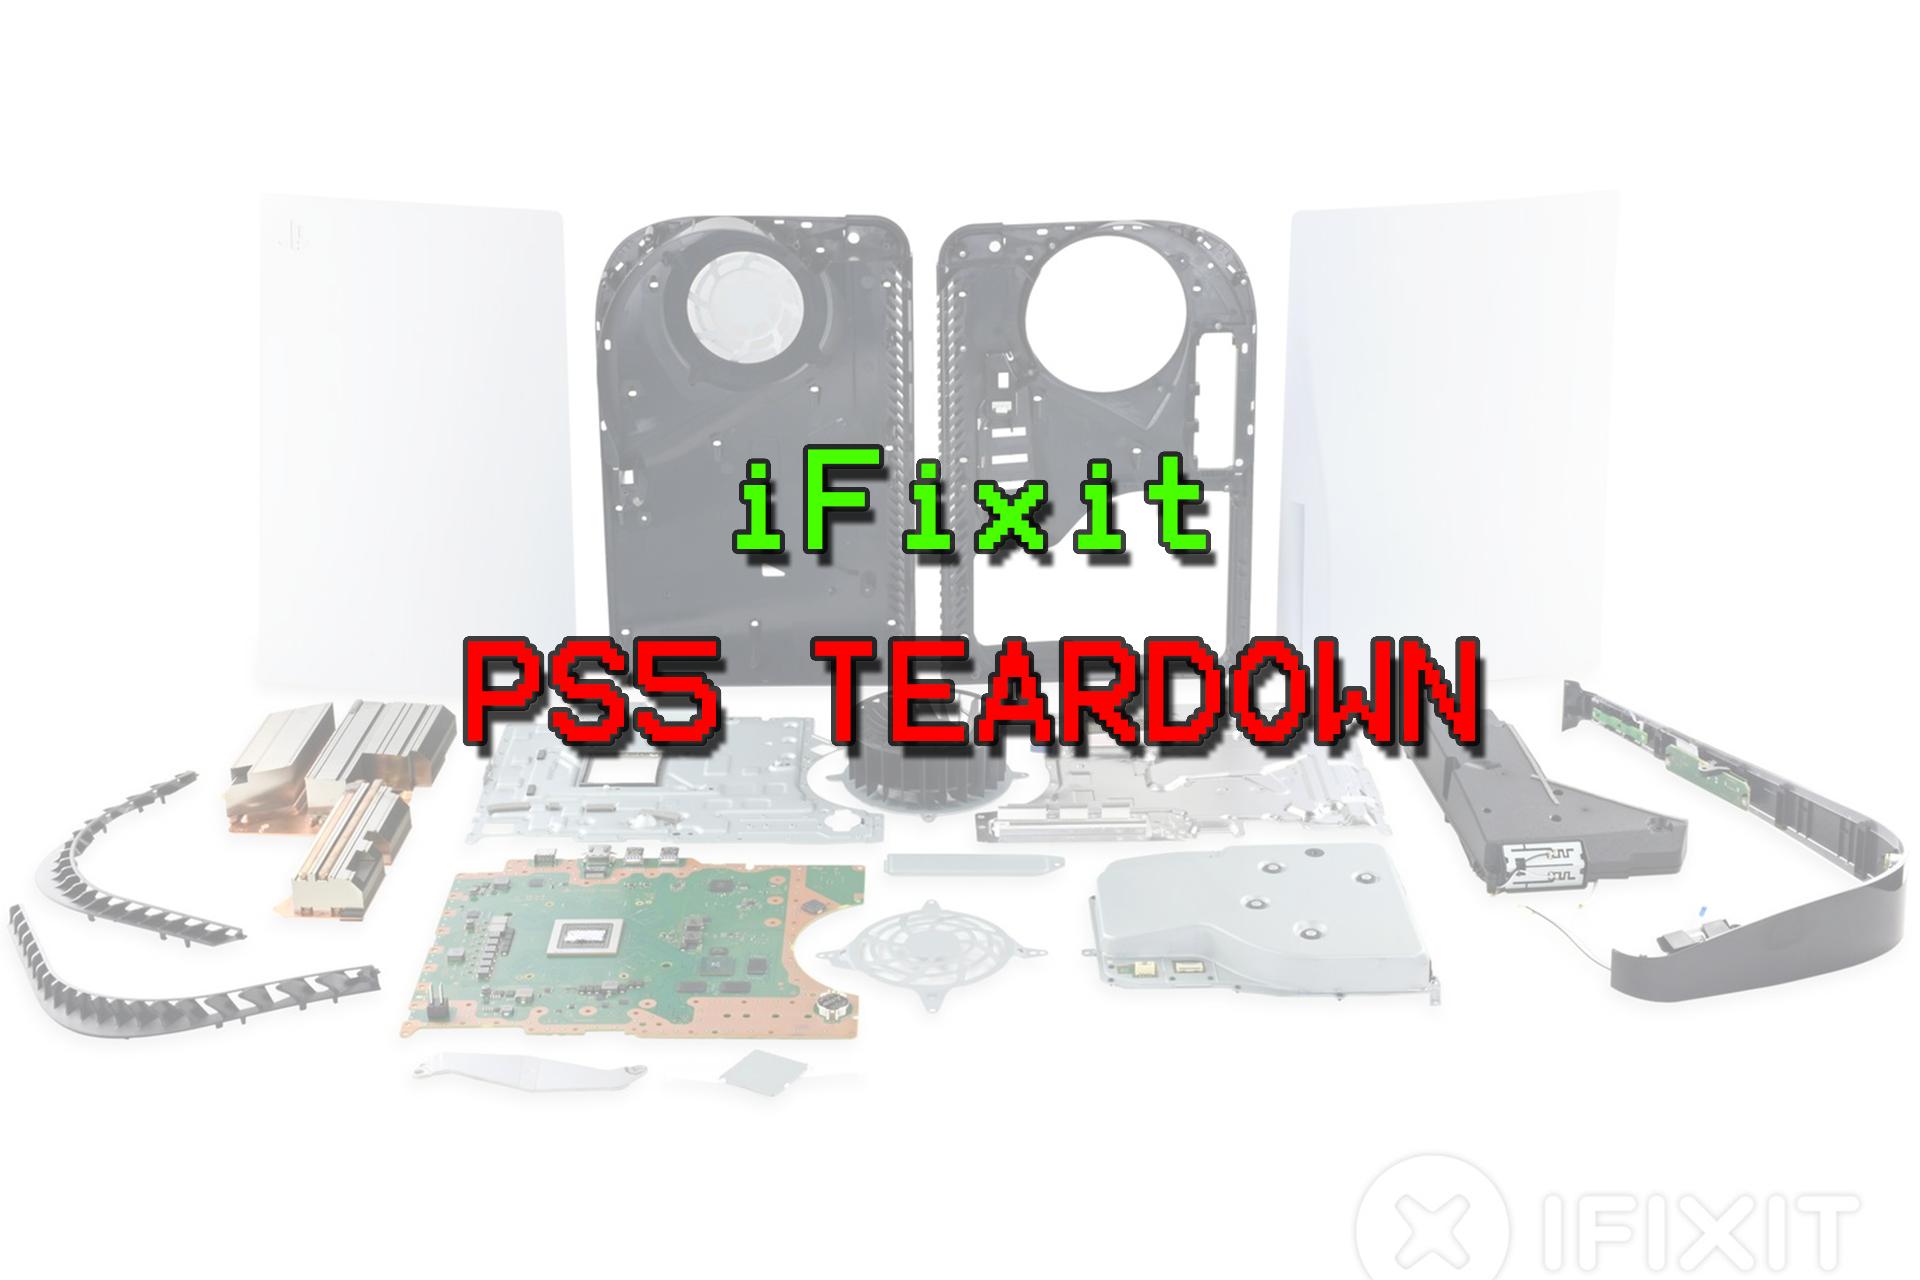 PS5 Teardown